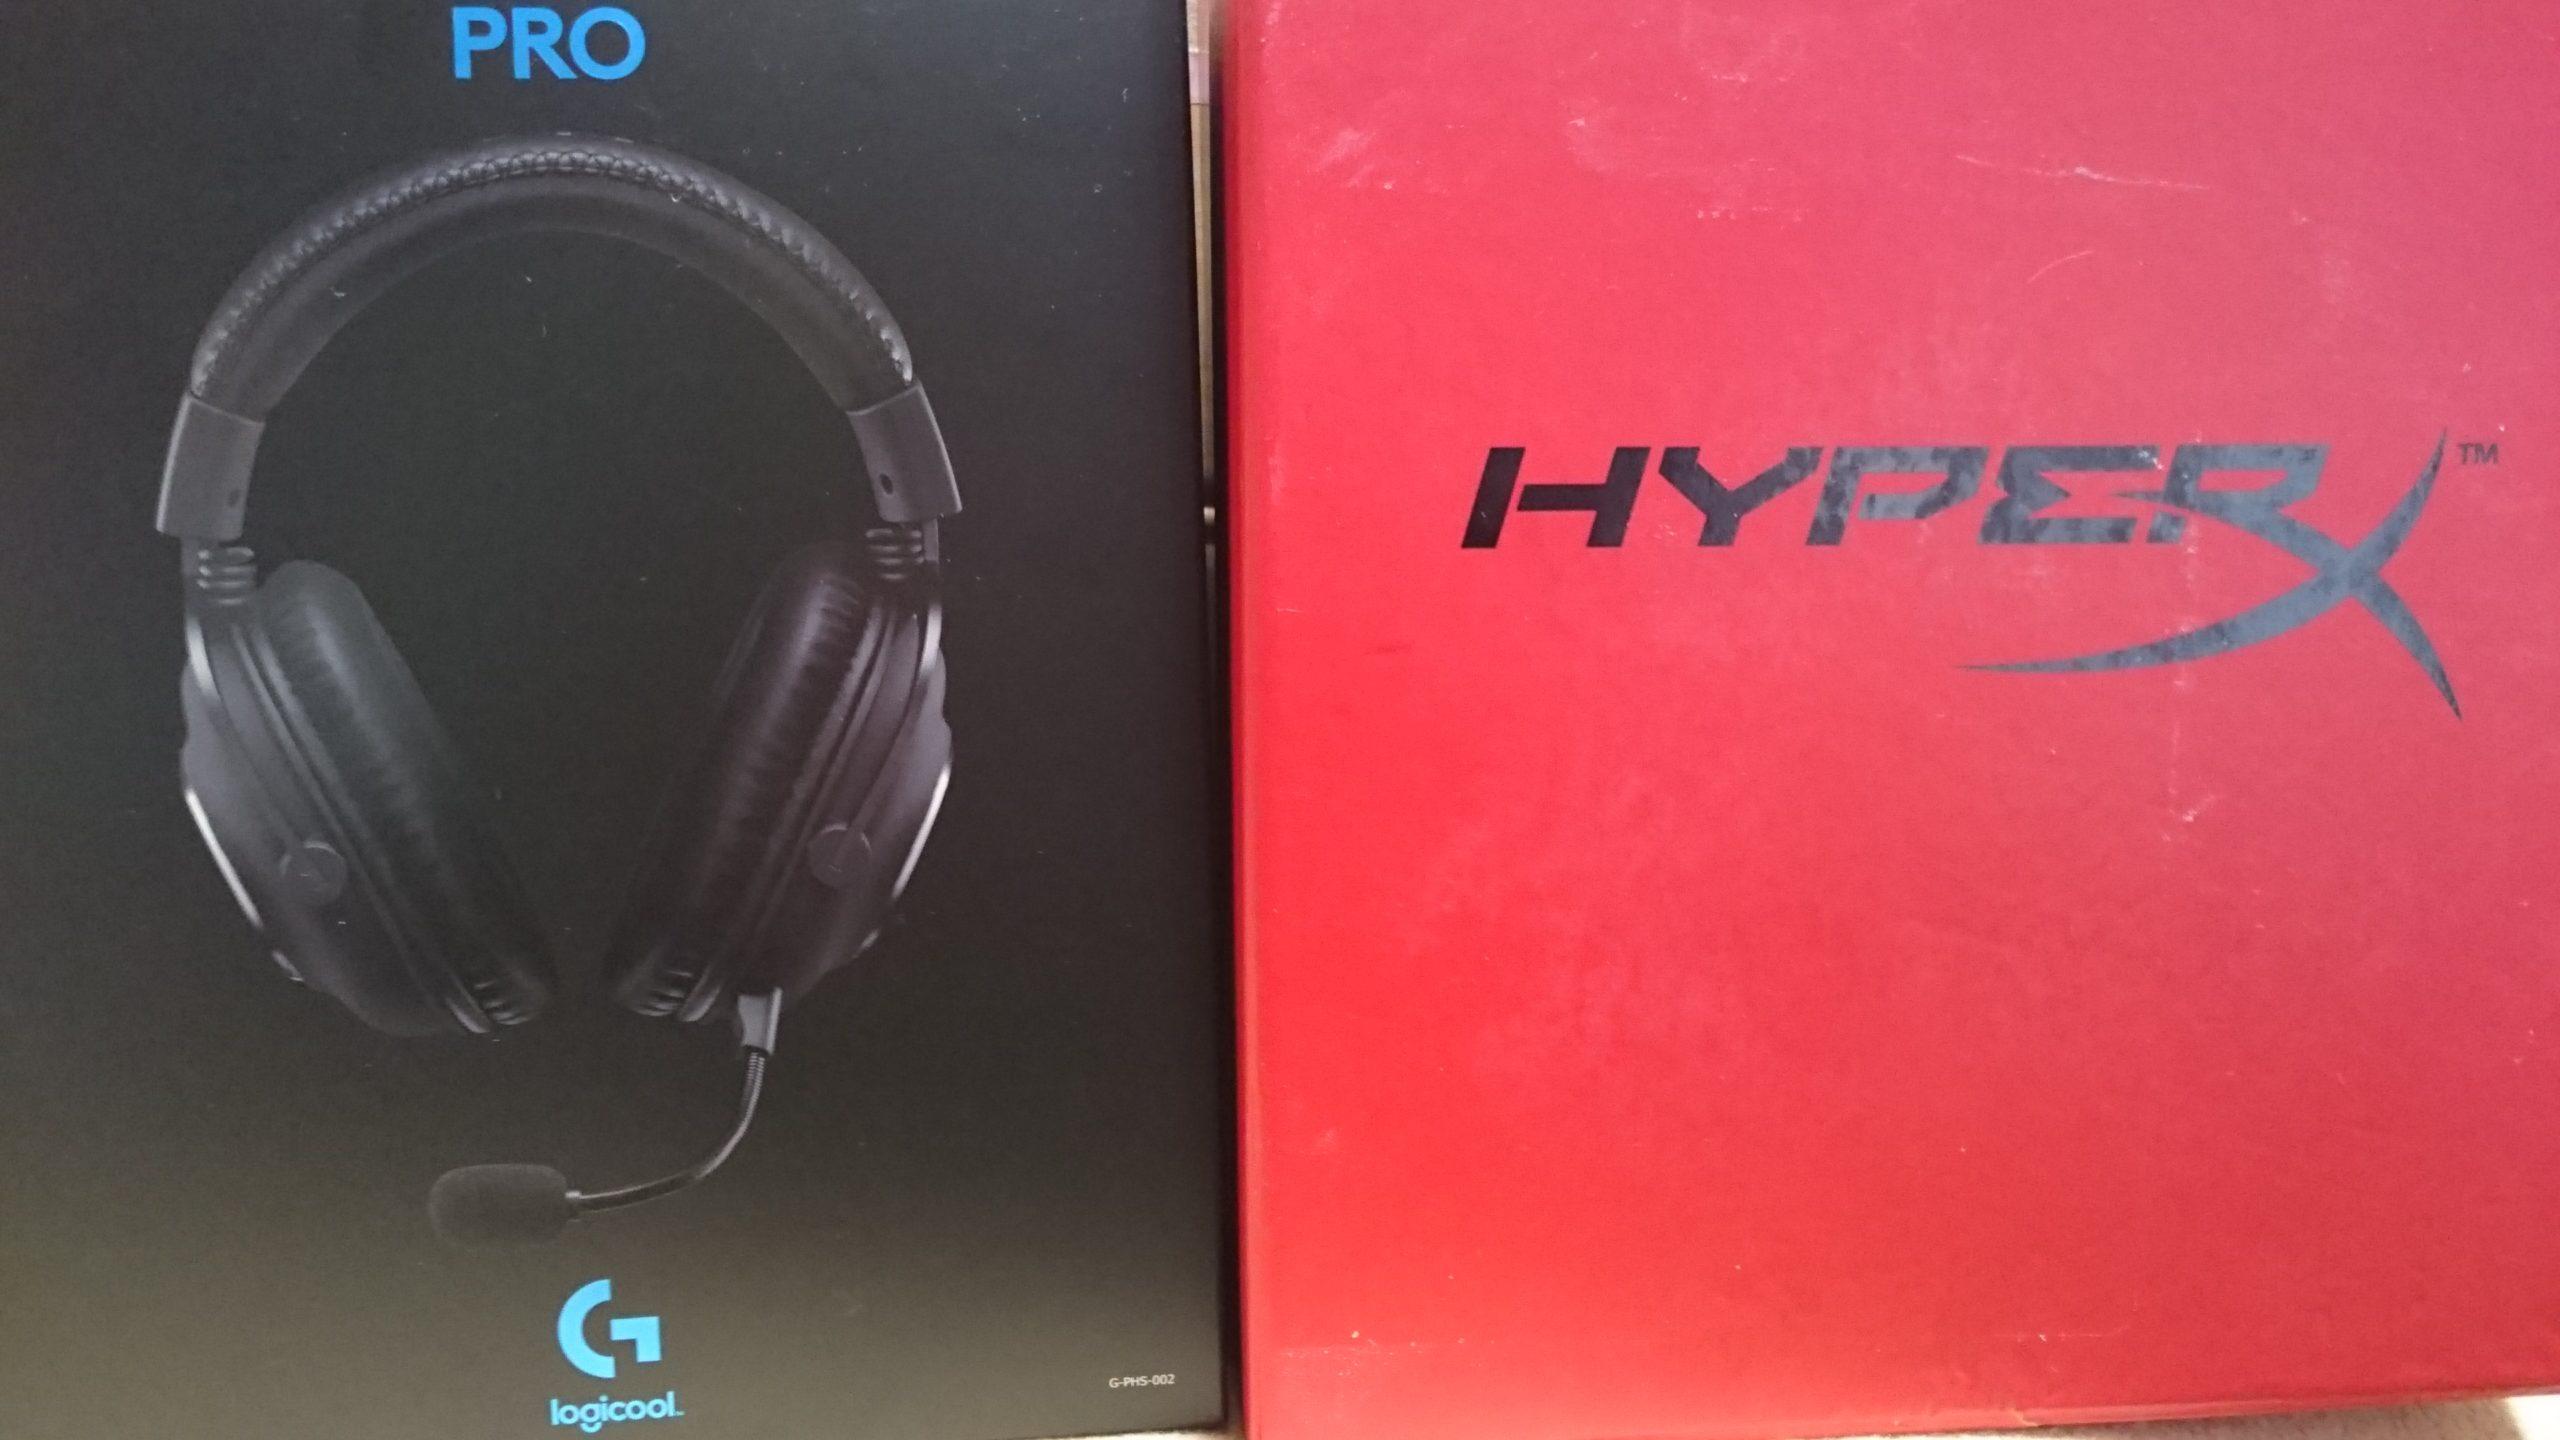 headset202002